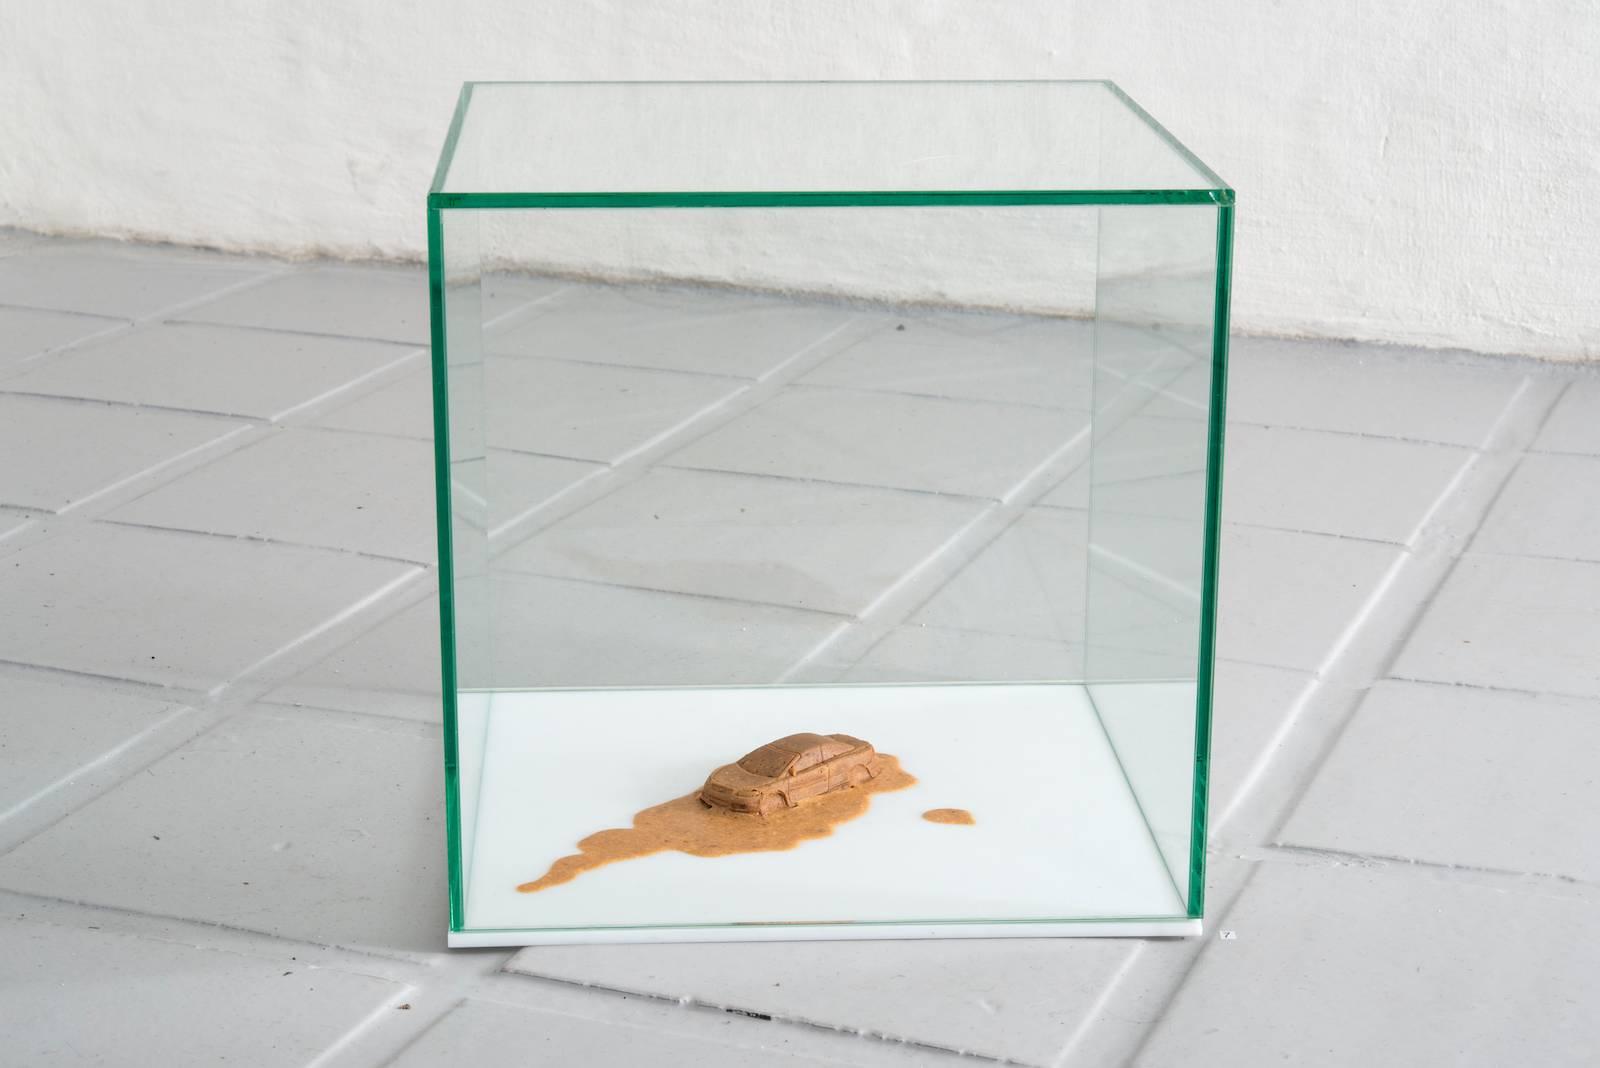 Lekebil, 2003, human semen, wood glue and glass, 8 x 5 x 4 cm